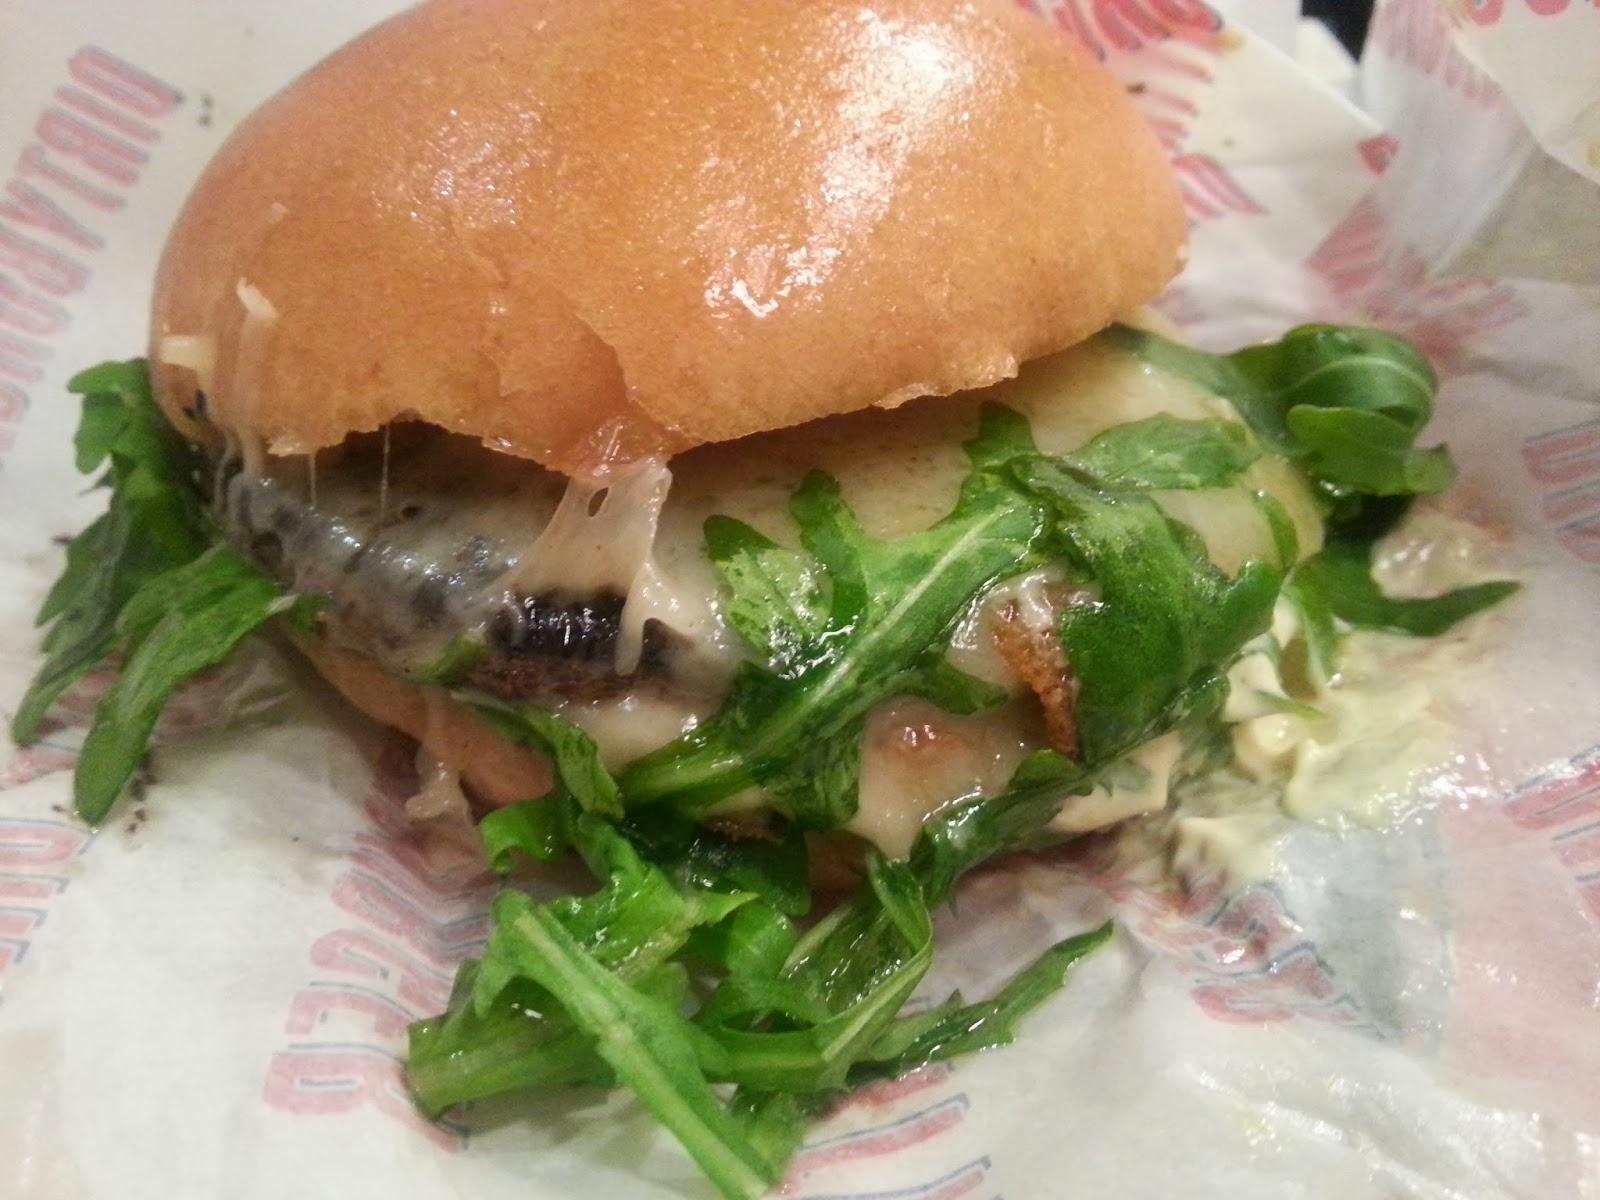 Dirty Burger's portobello mushroom special